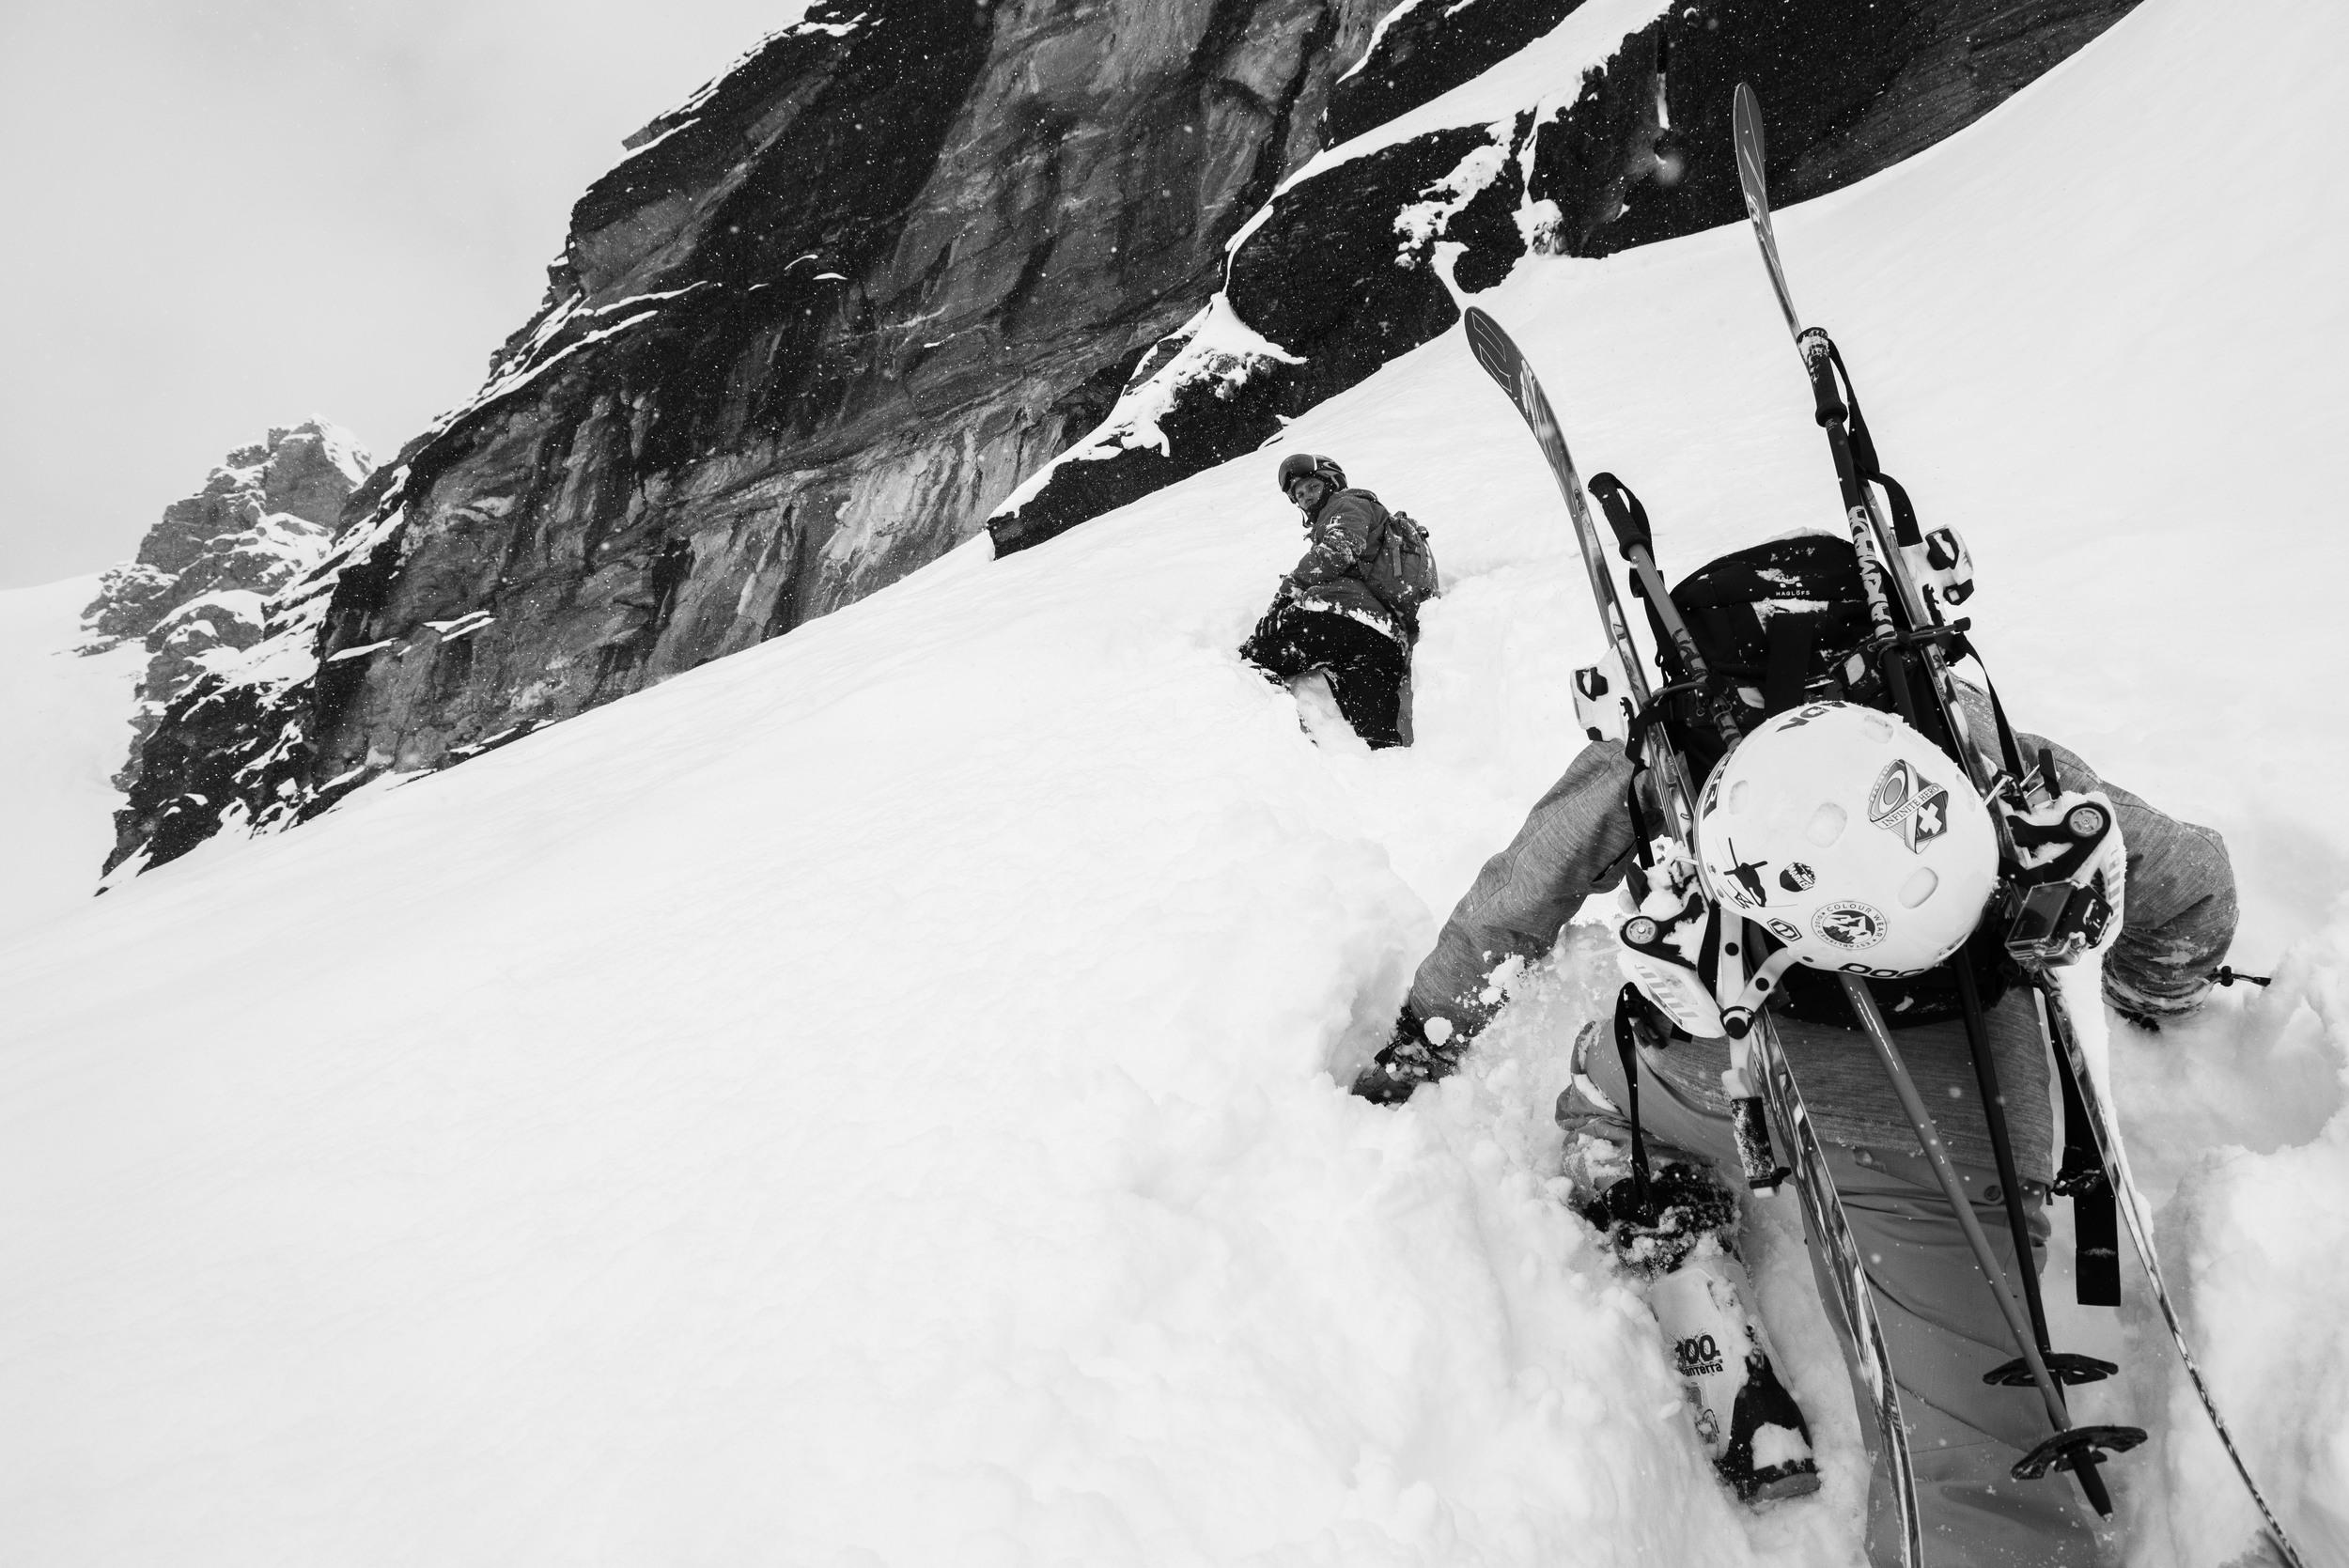 redbull-illume-submission-gustav-thuesen-photographer-fotograf-video-photo-foto-action-sports-adventure-travel-14.jpg